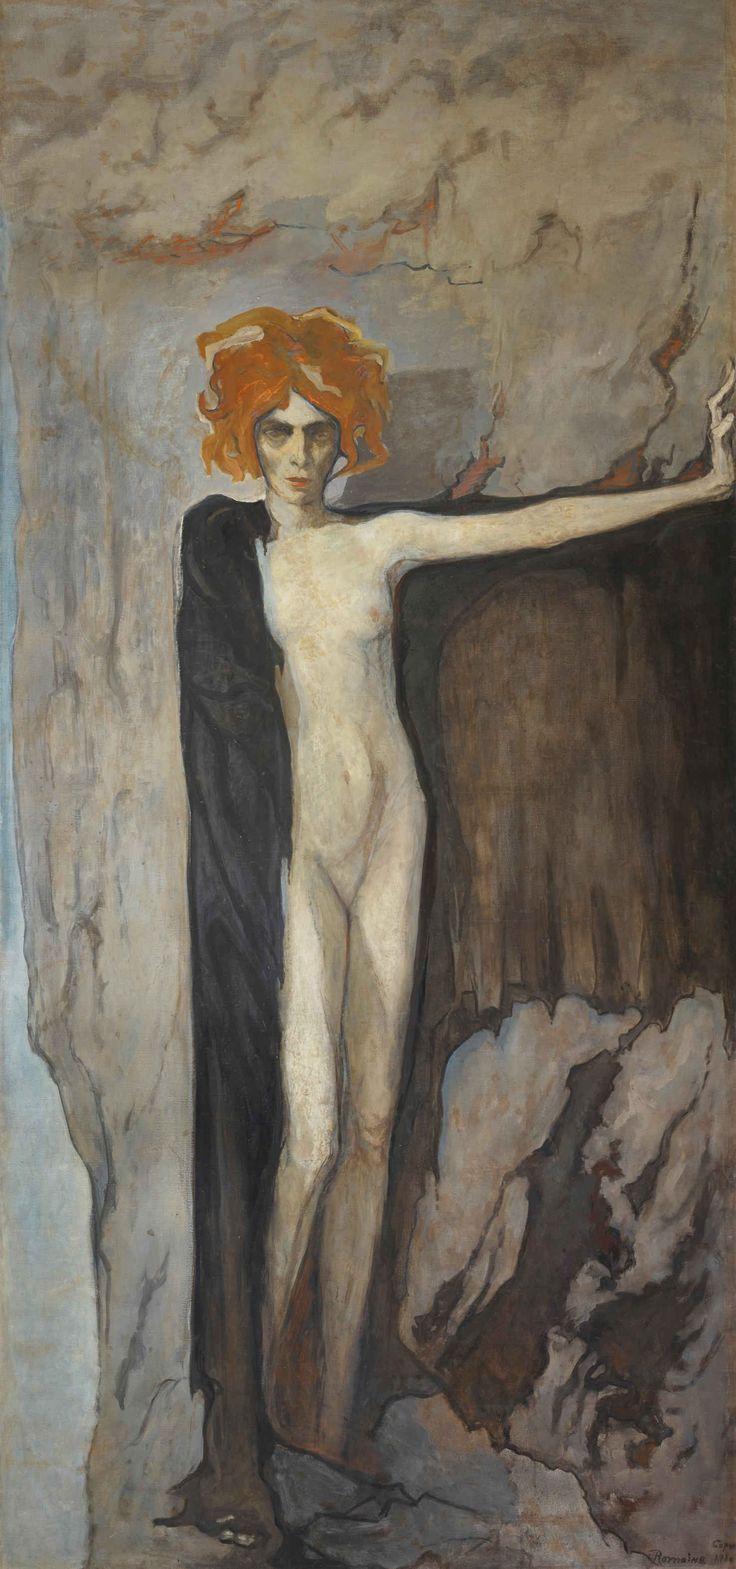 Portrait of Marchesa Luisa Casati, 1920 by Romaine Brooks, (American expatriate artist, 1874-1970)